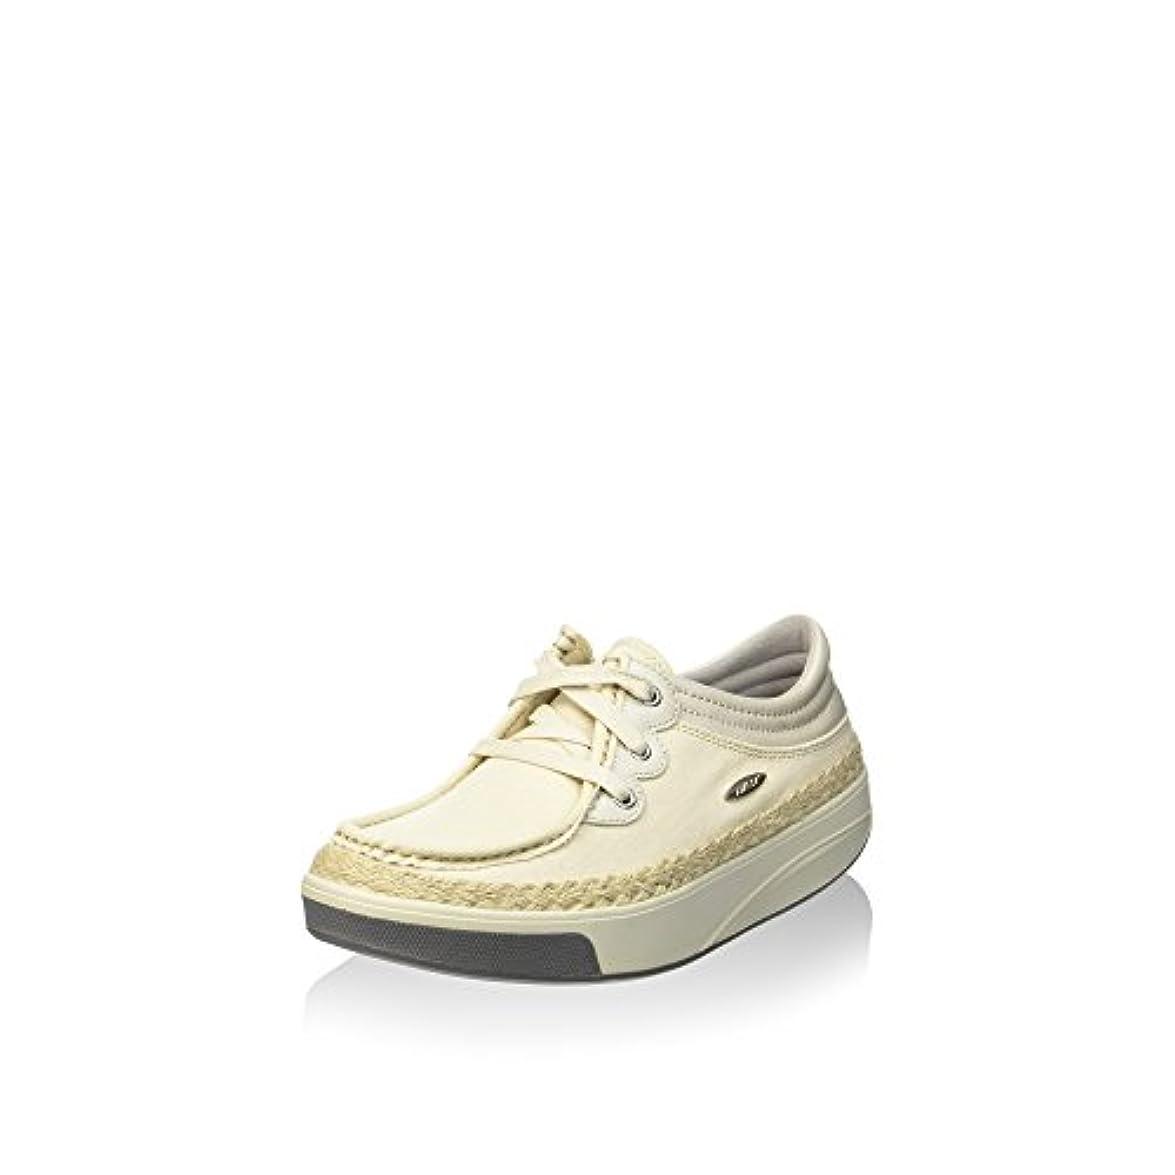 Donna Kito 3-eye W Lace Mbt Sneaker